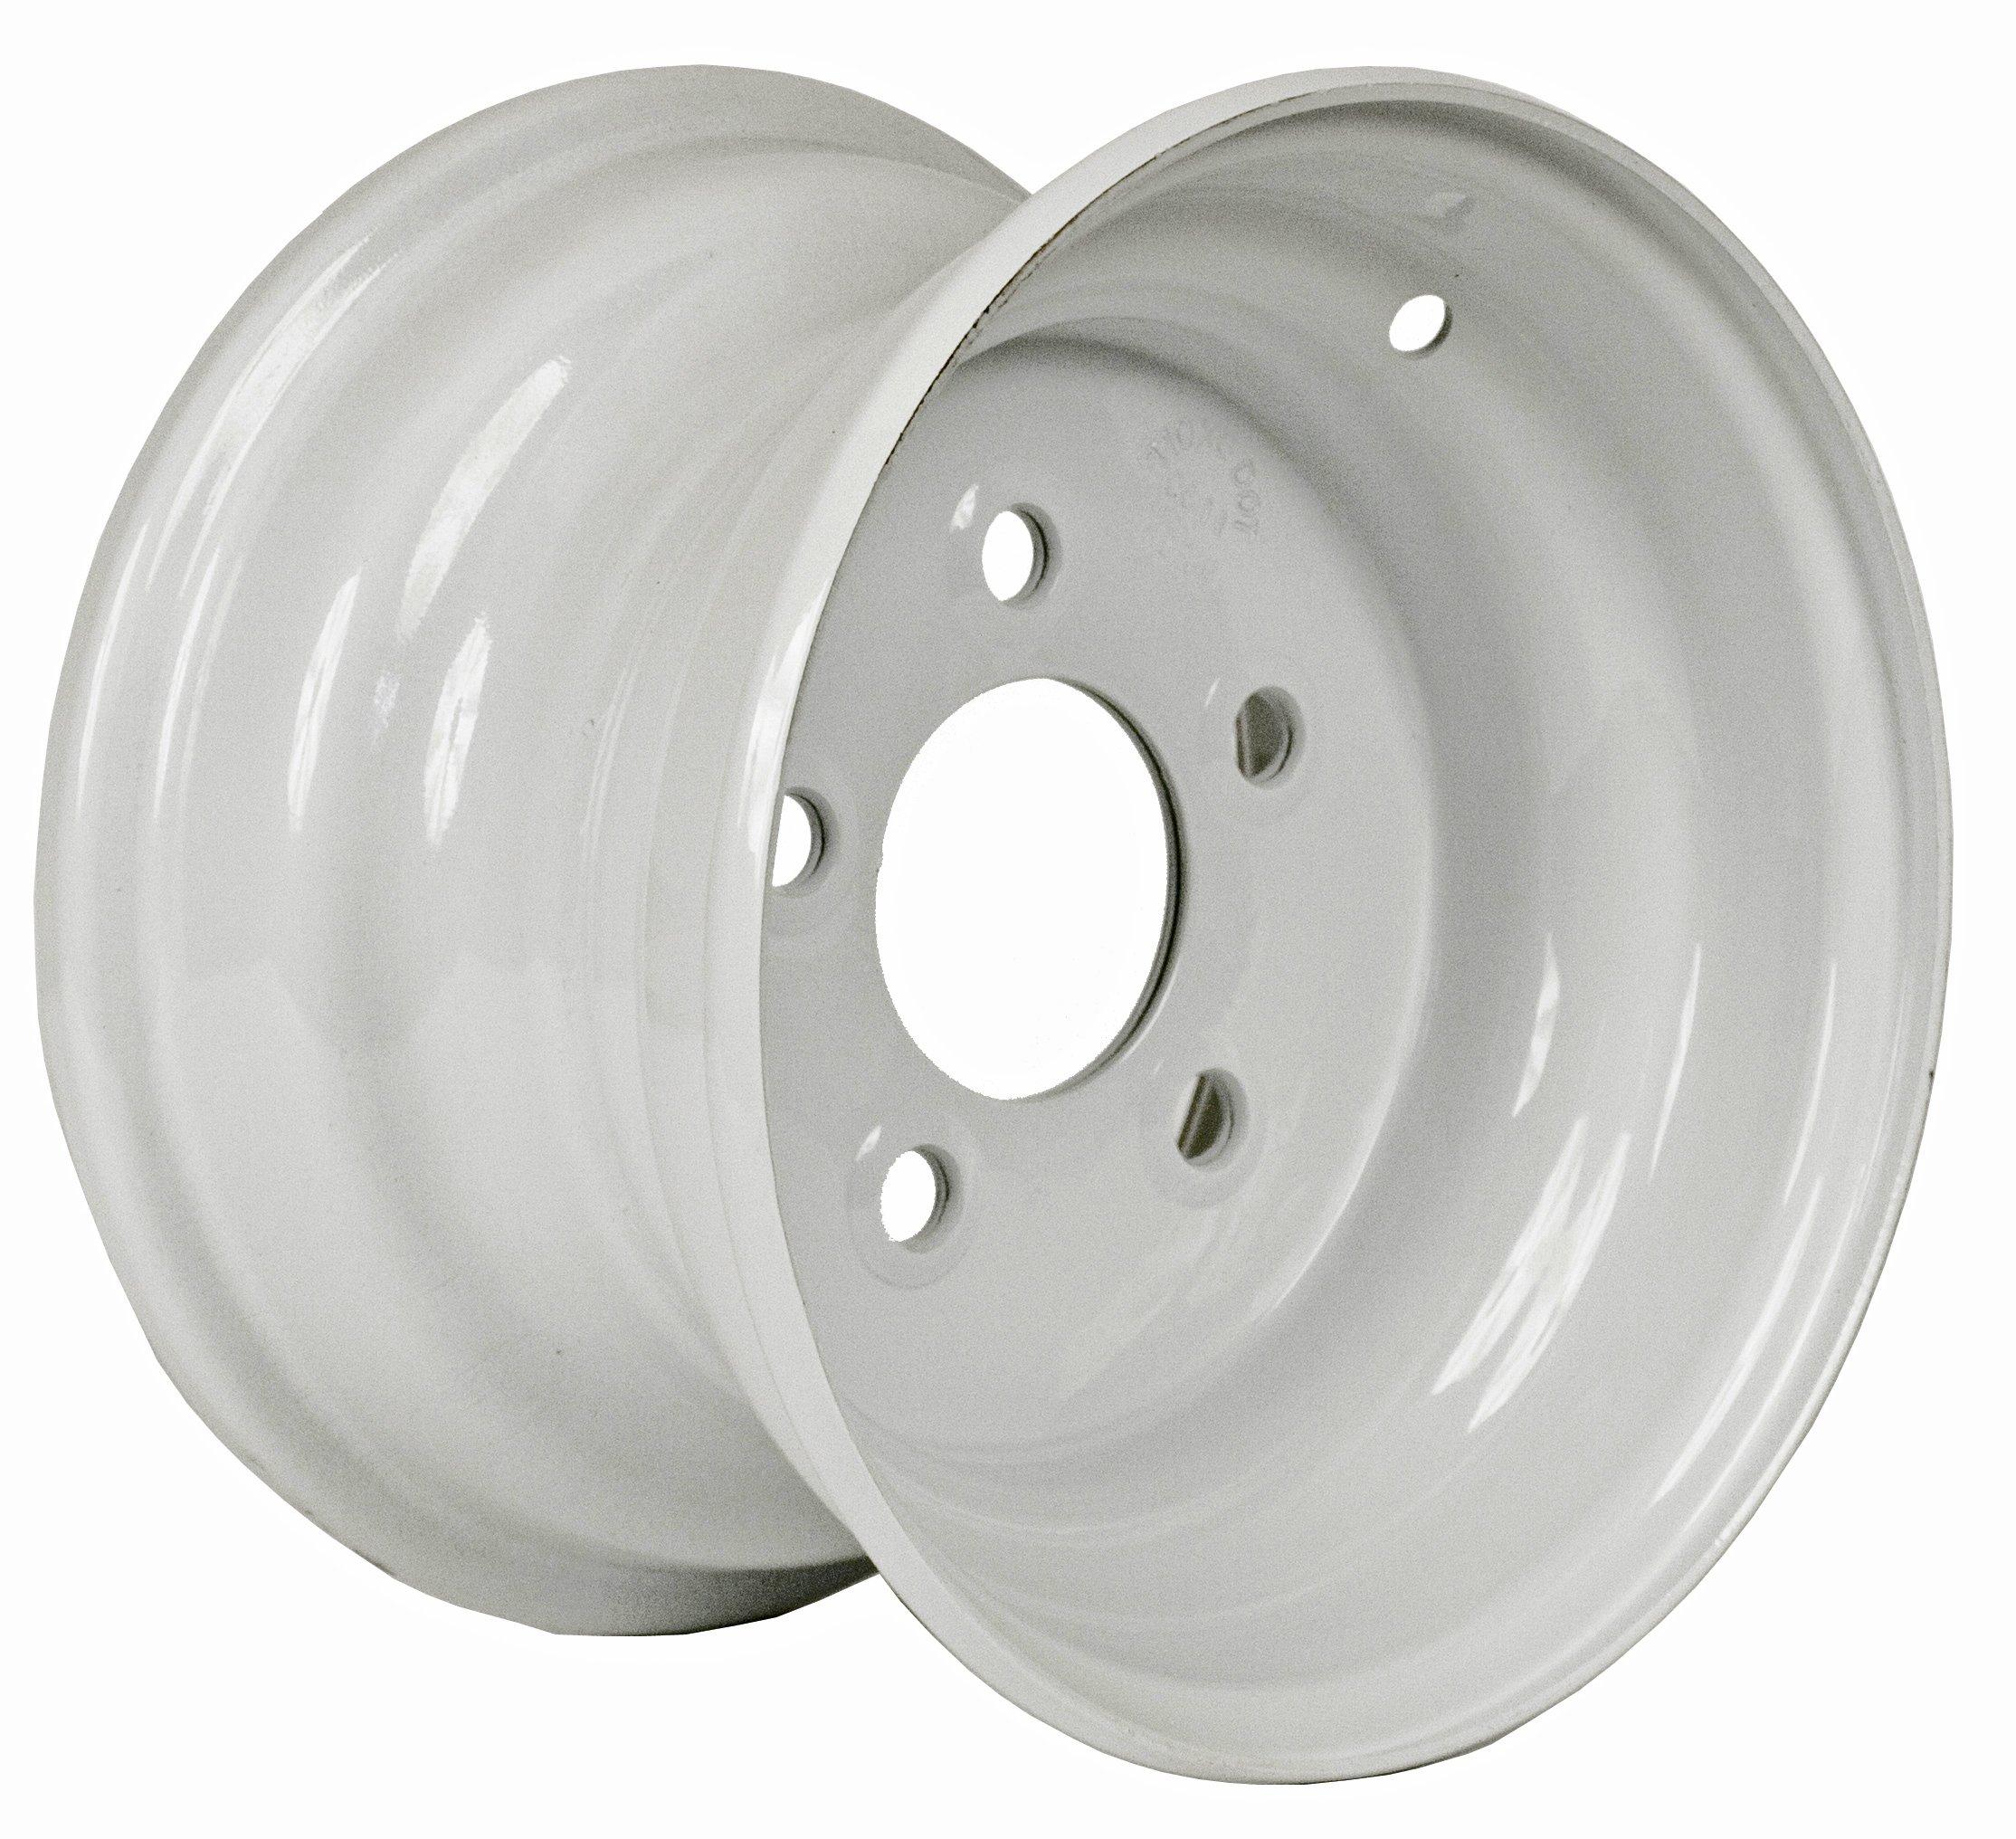 Martin Wheel 5-Hole Steel Trailer Wheel (10x6/5x4.5)